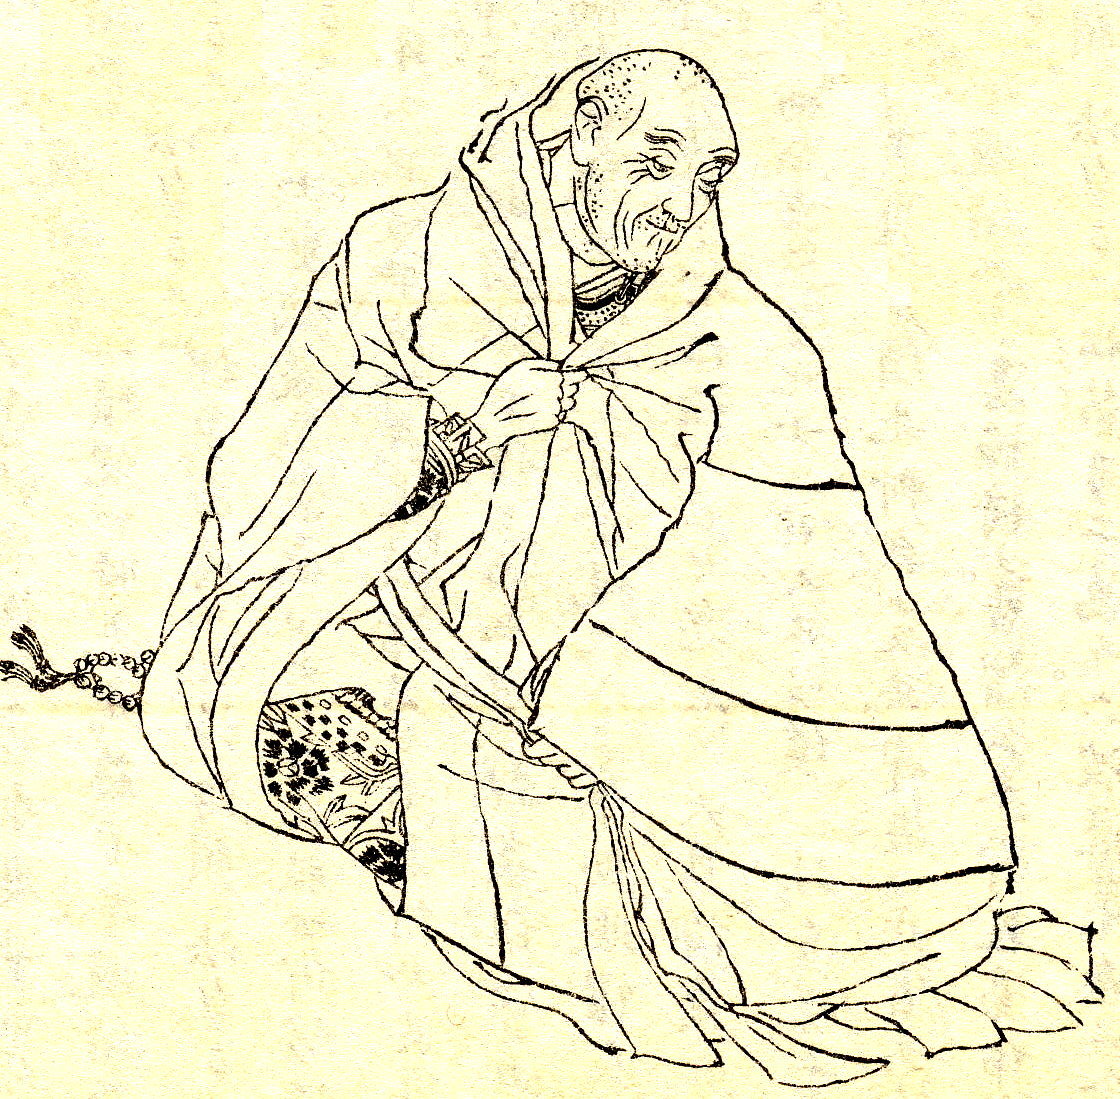 http://upload.wikimedia.org/wikipedia/commons/d/de/Taira_no_Kiyomori.jpg